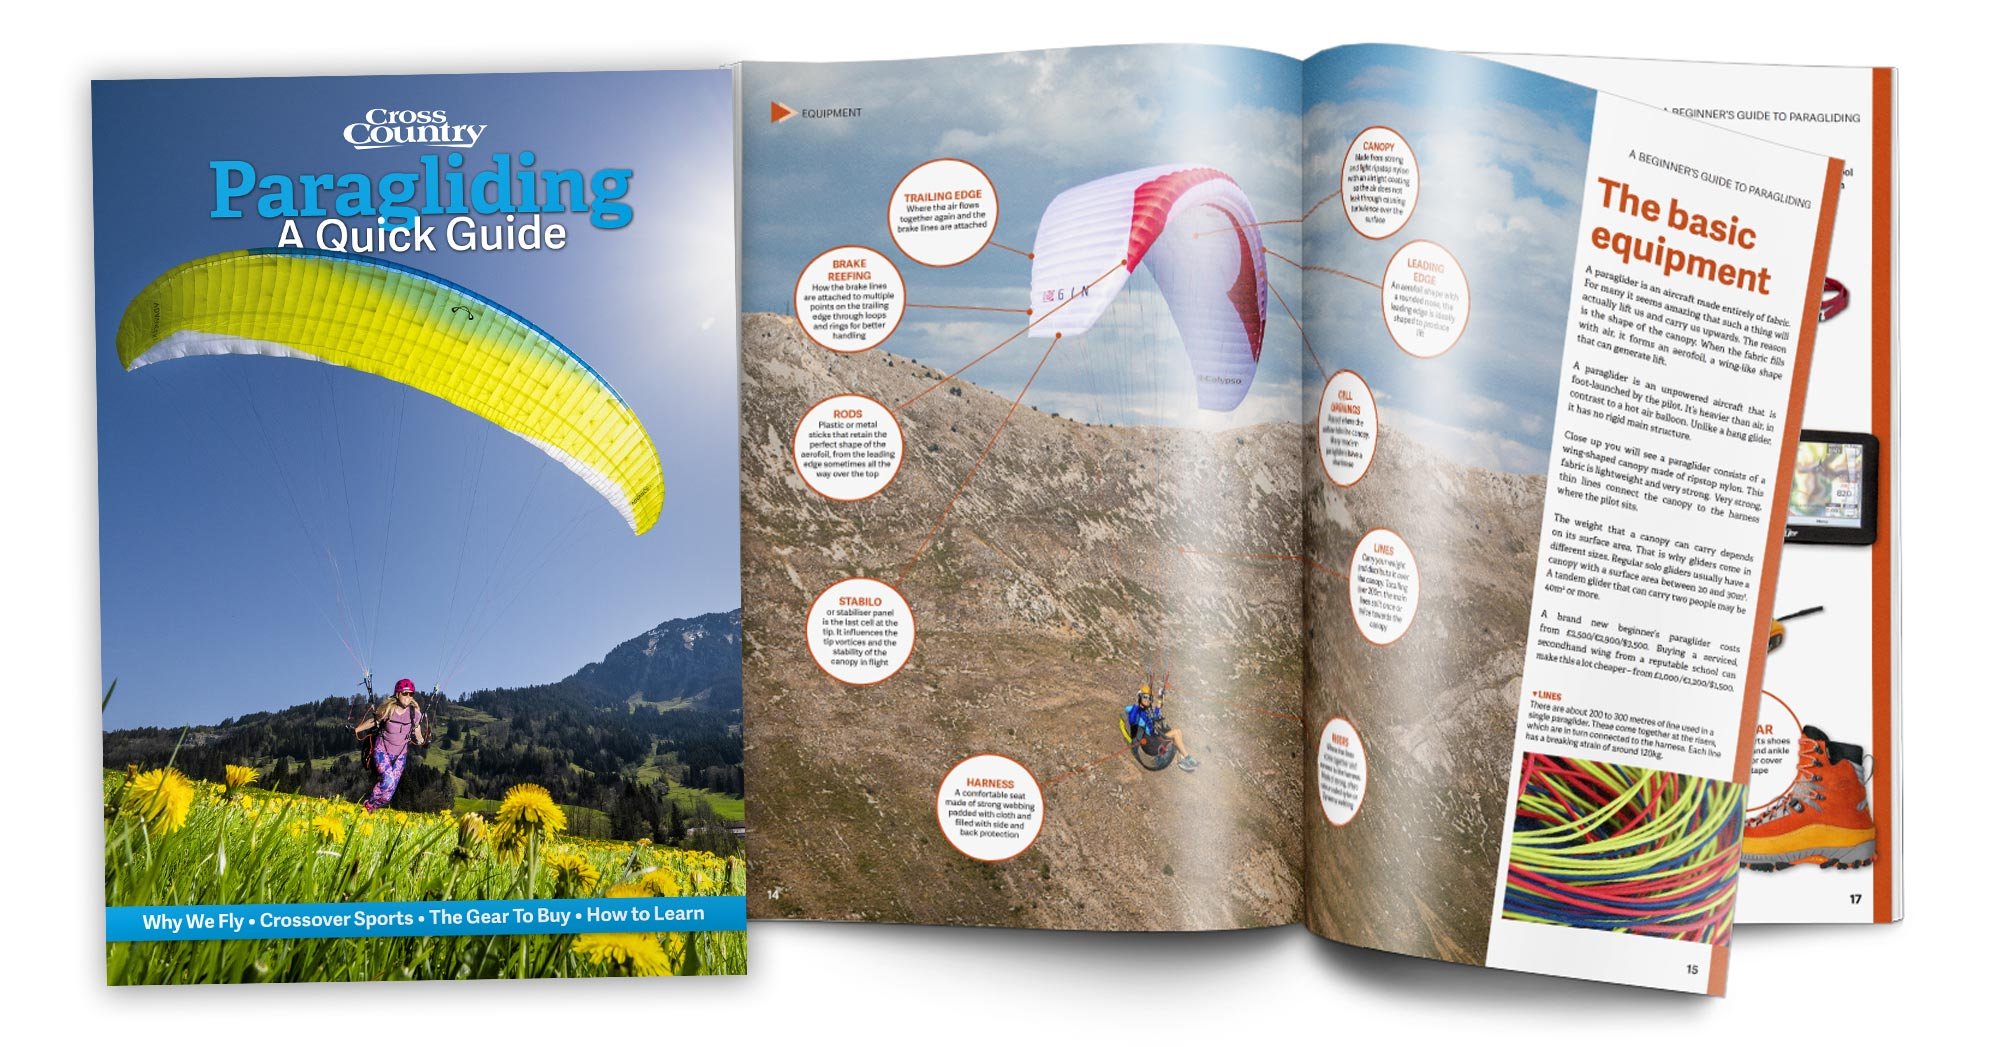 Paragliding: A Quick Guide